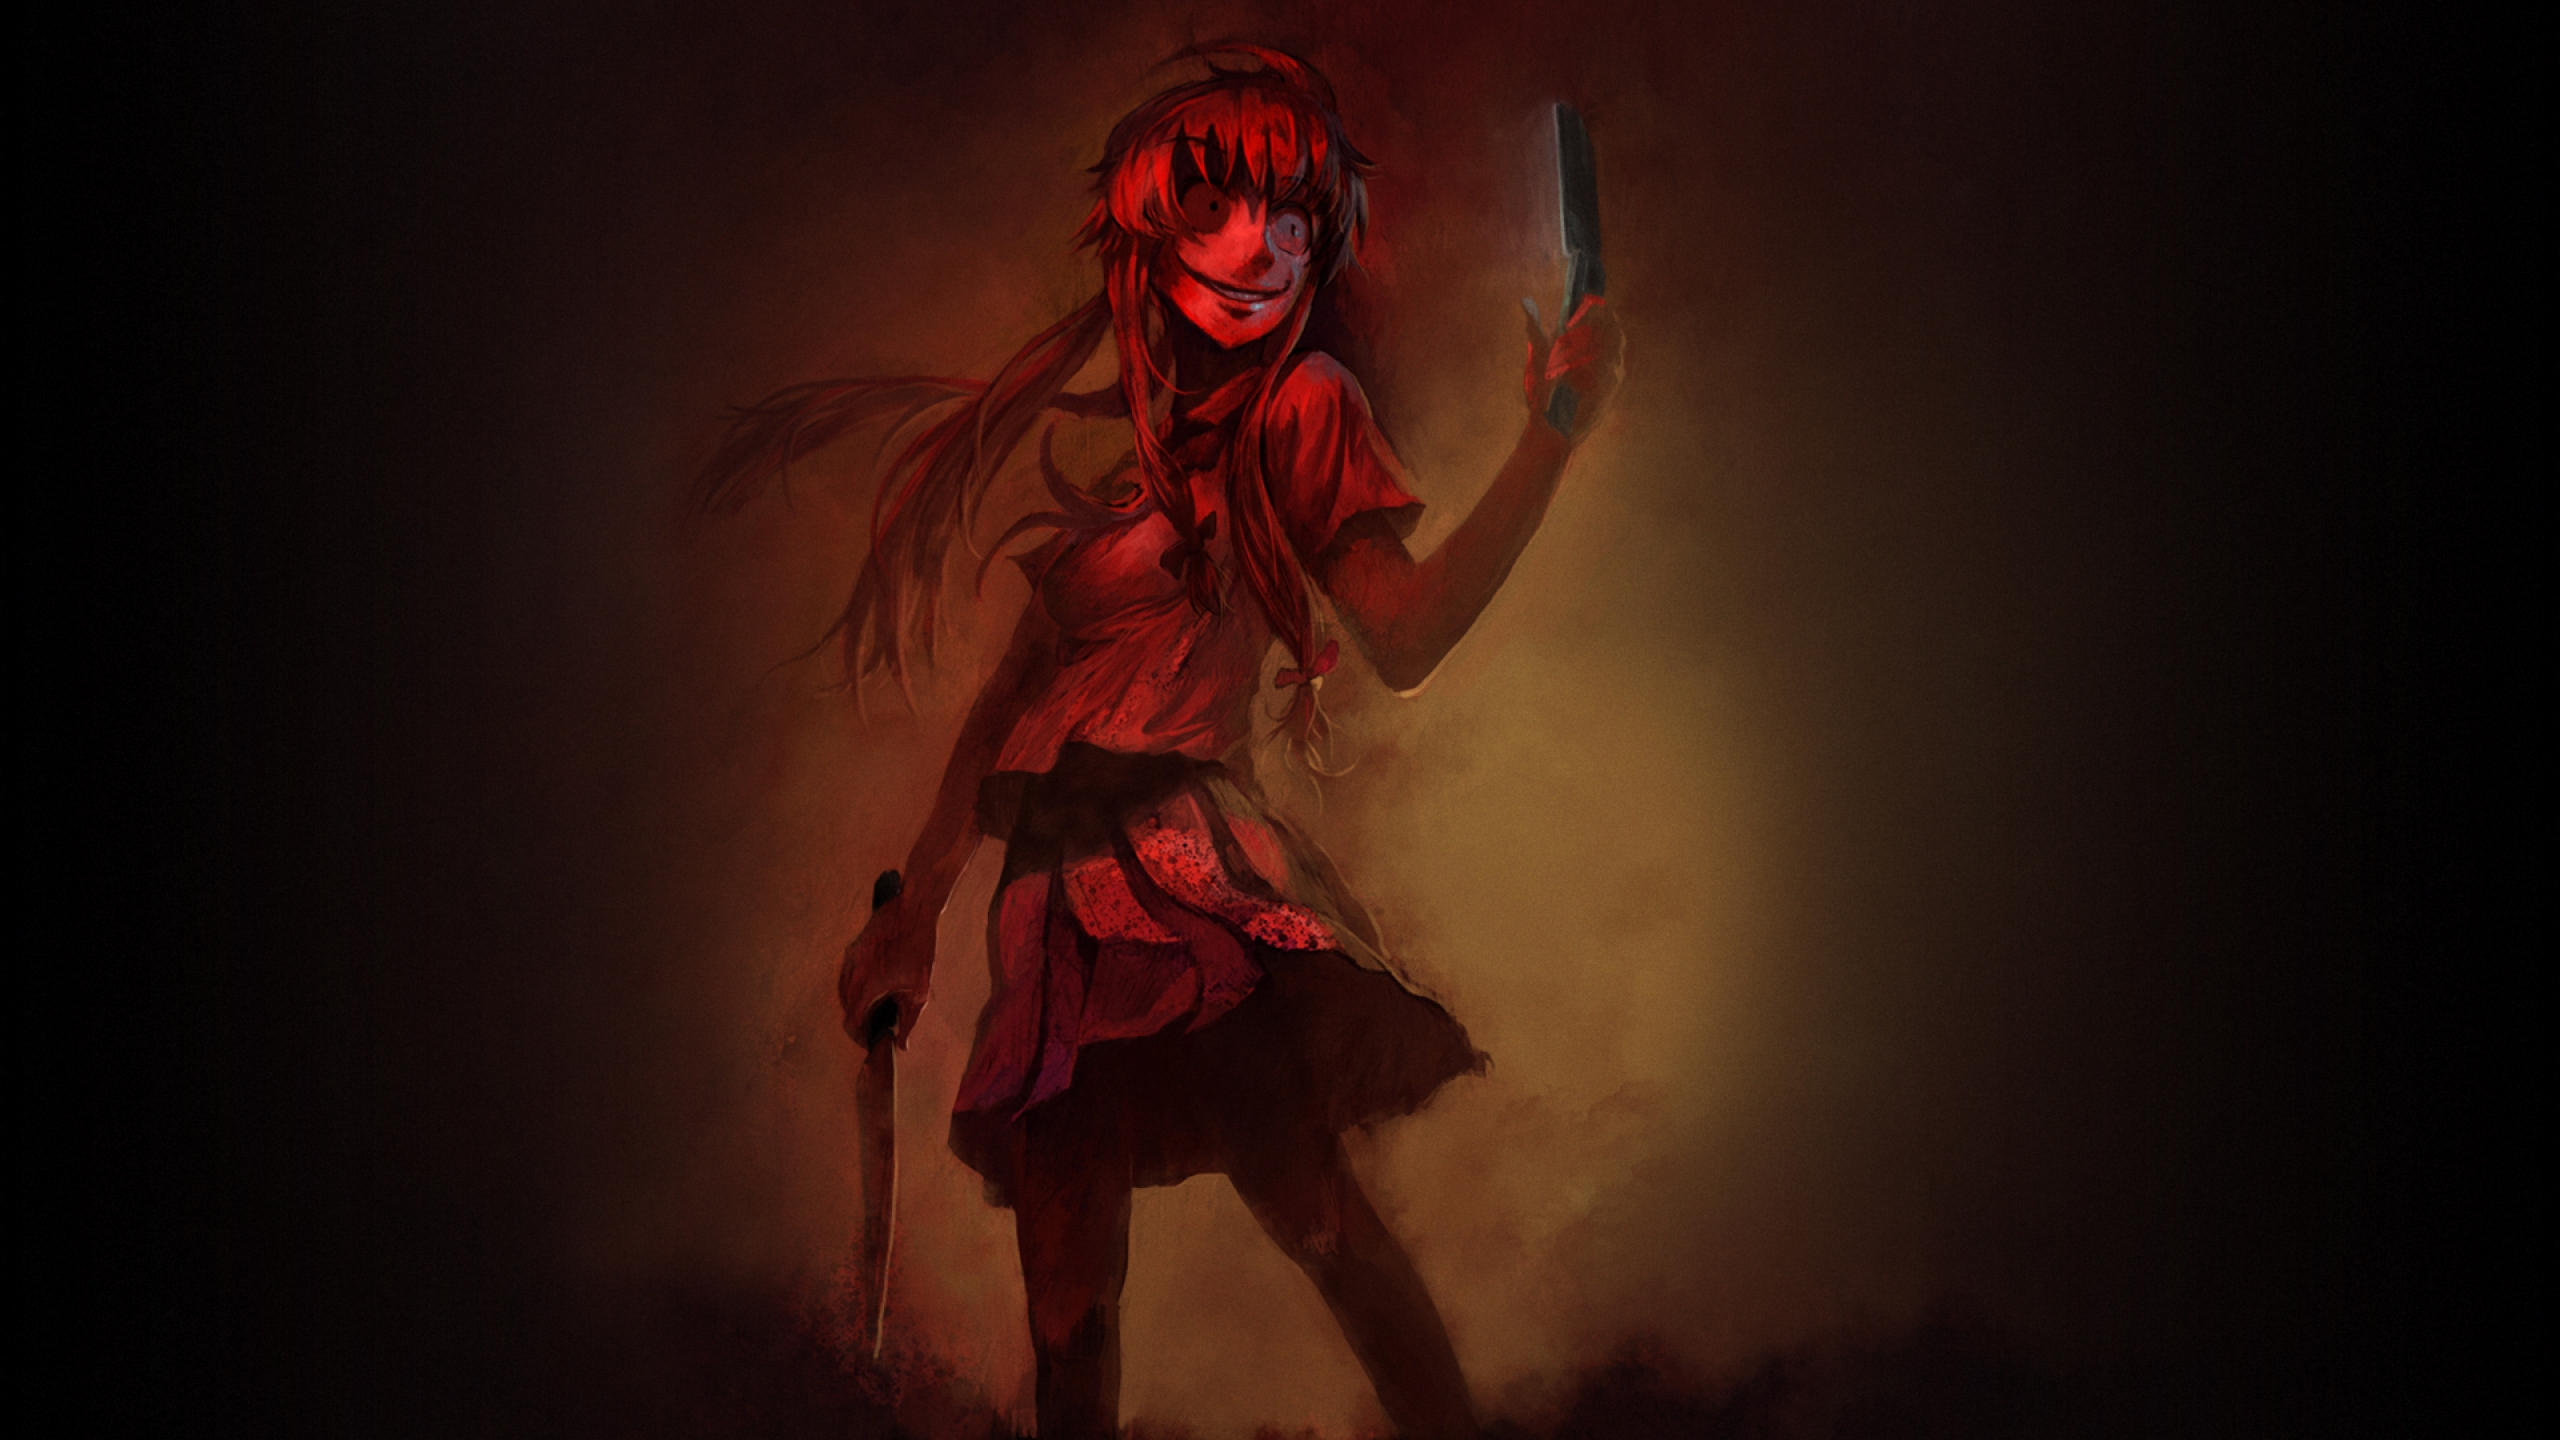 Yuno Gasai Full HD Wallpaper And Background Image